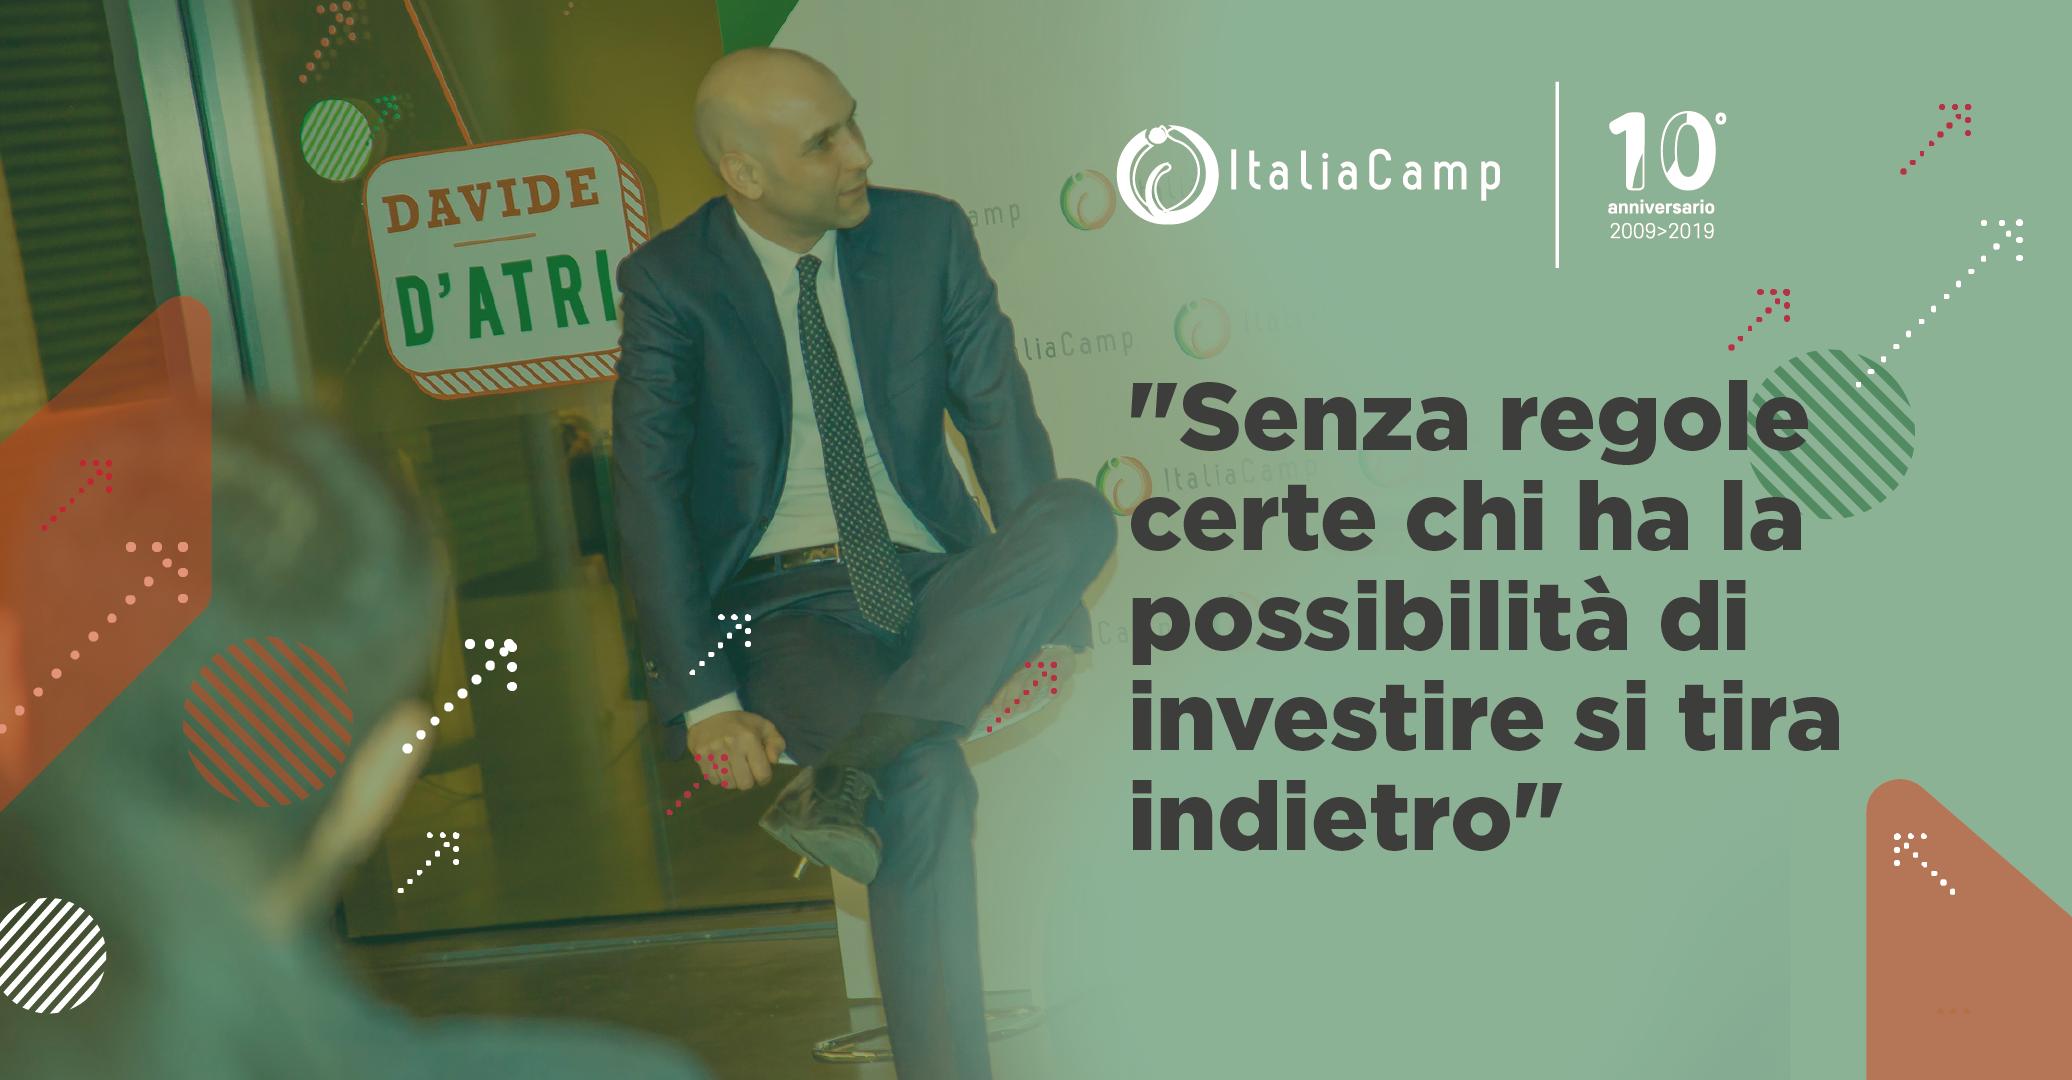 Davide D'Atri ospite di ItaliaCamp per #InnovareCon